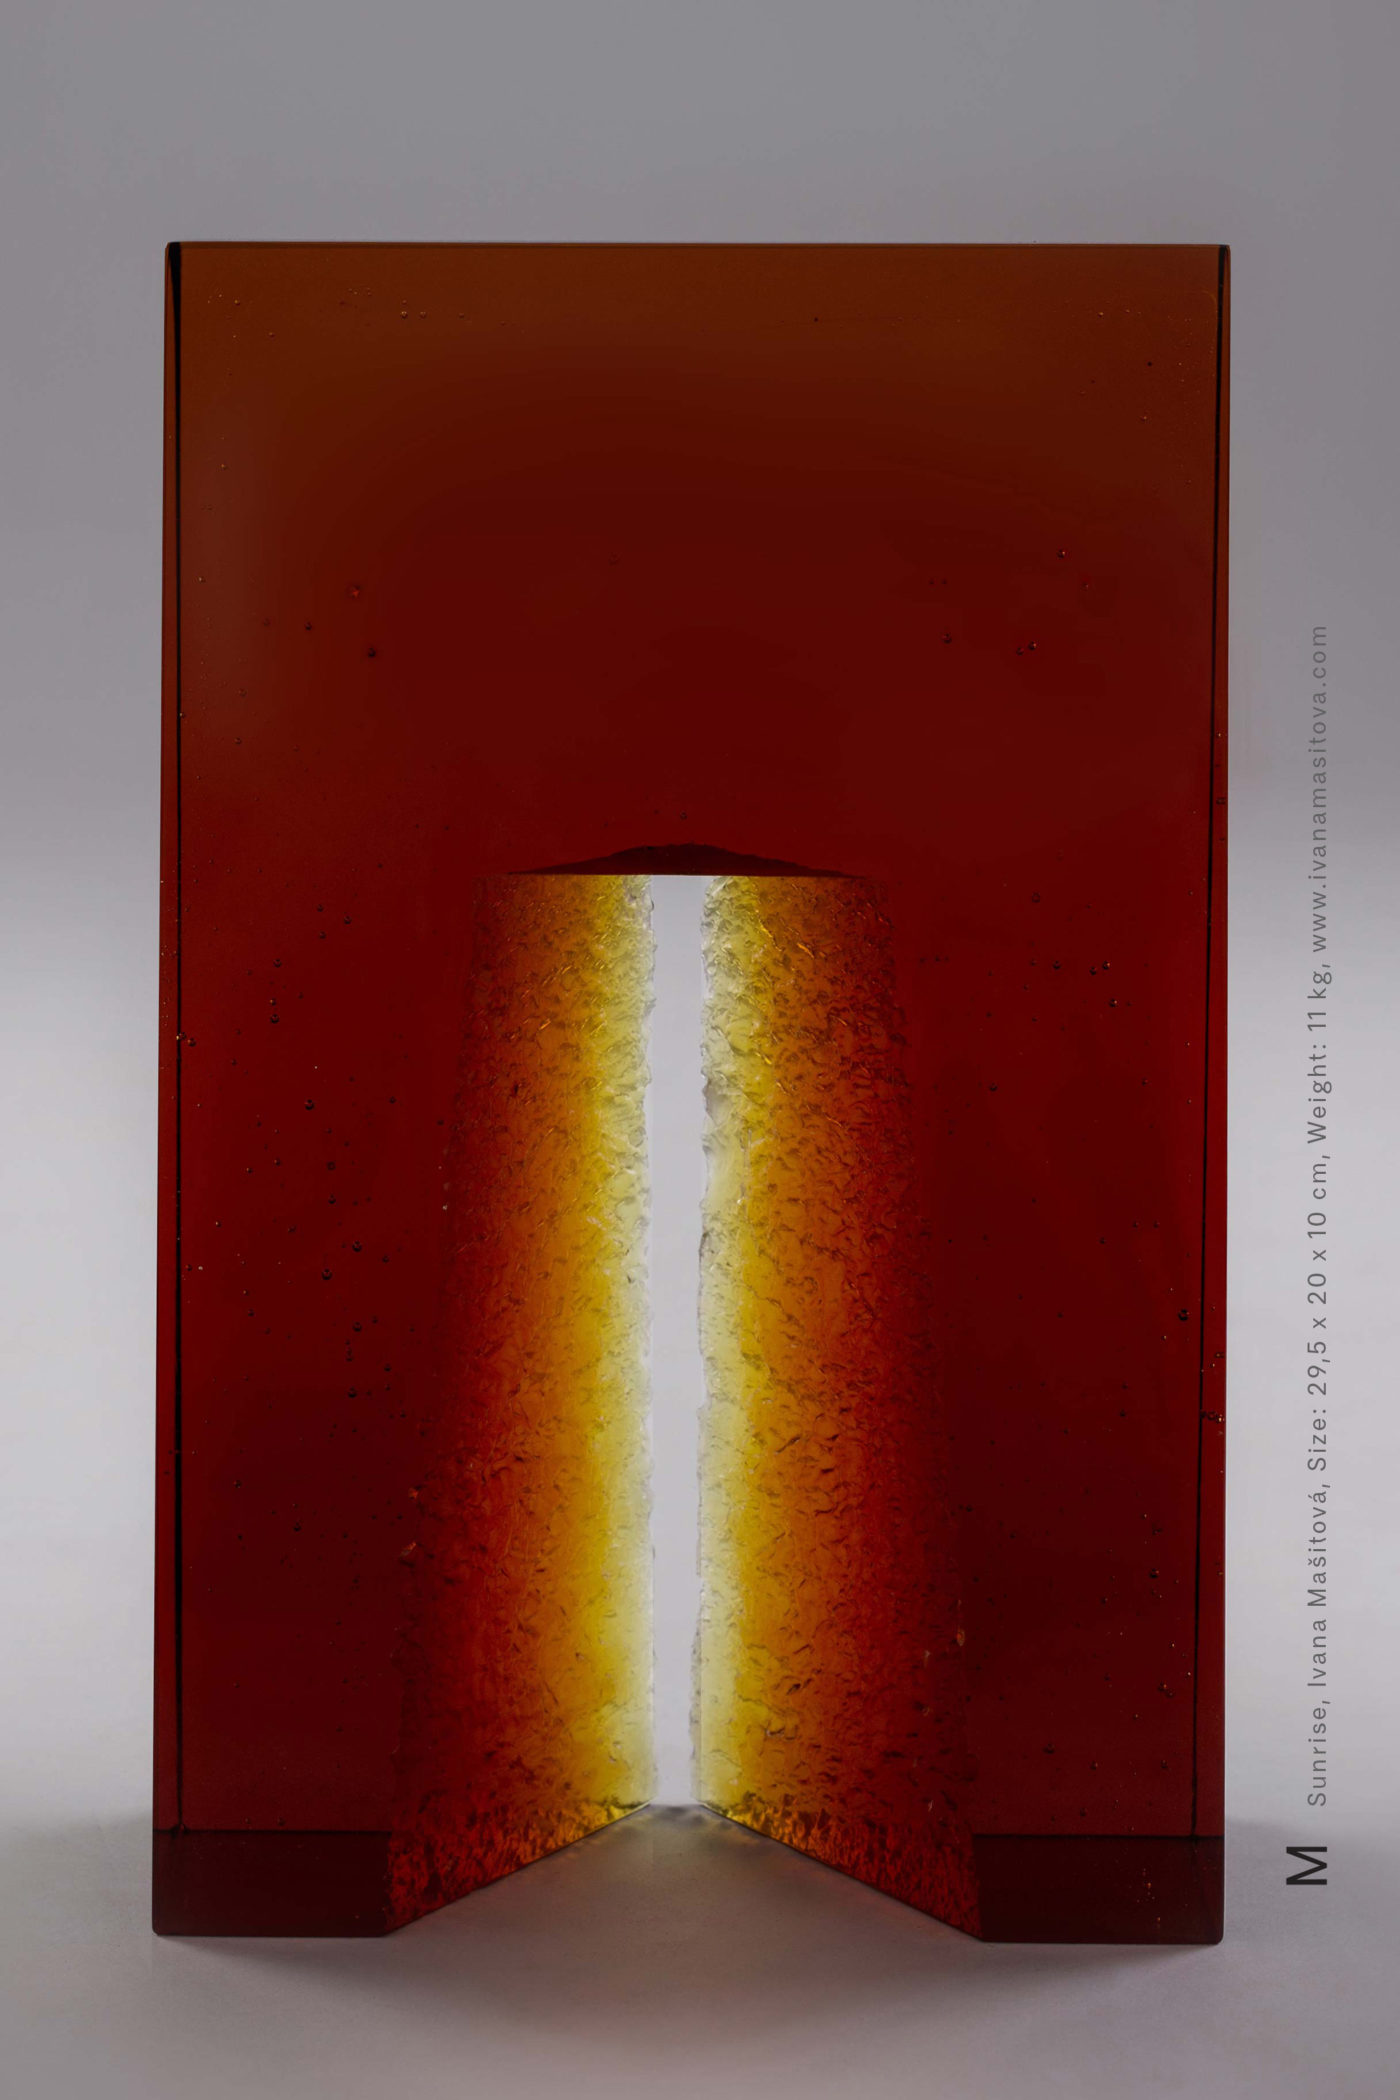 Vychod-slunce_Sunrise,29,5x20x10cm,11kg